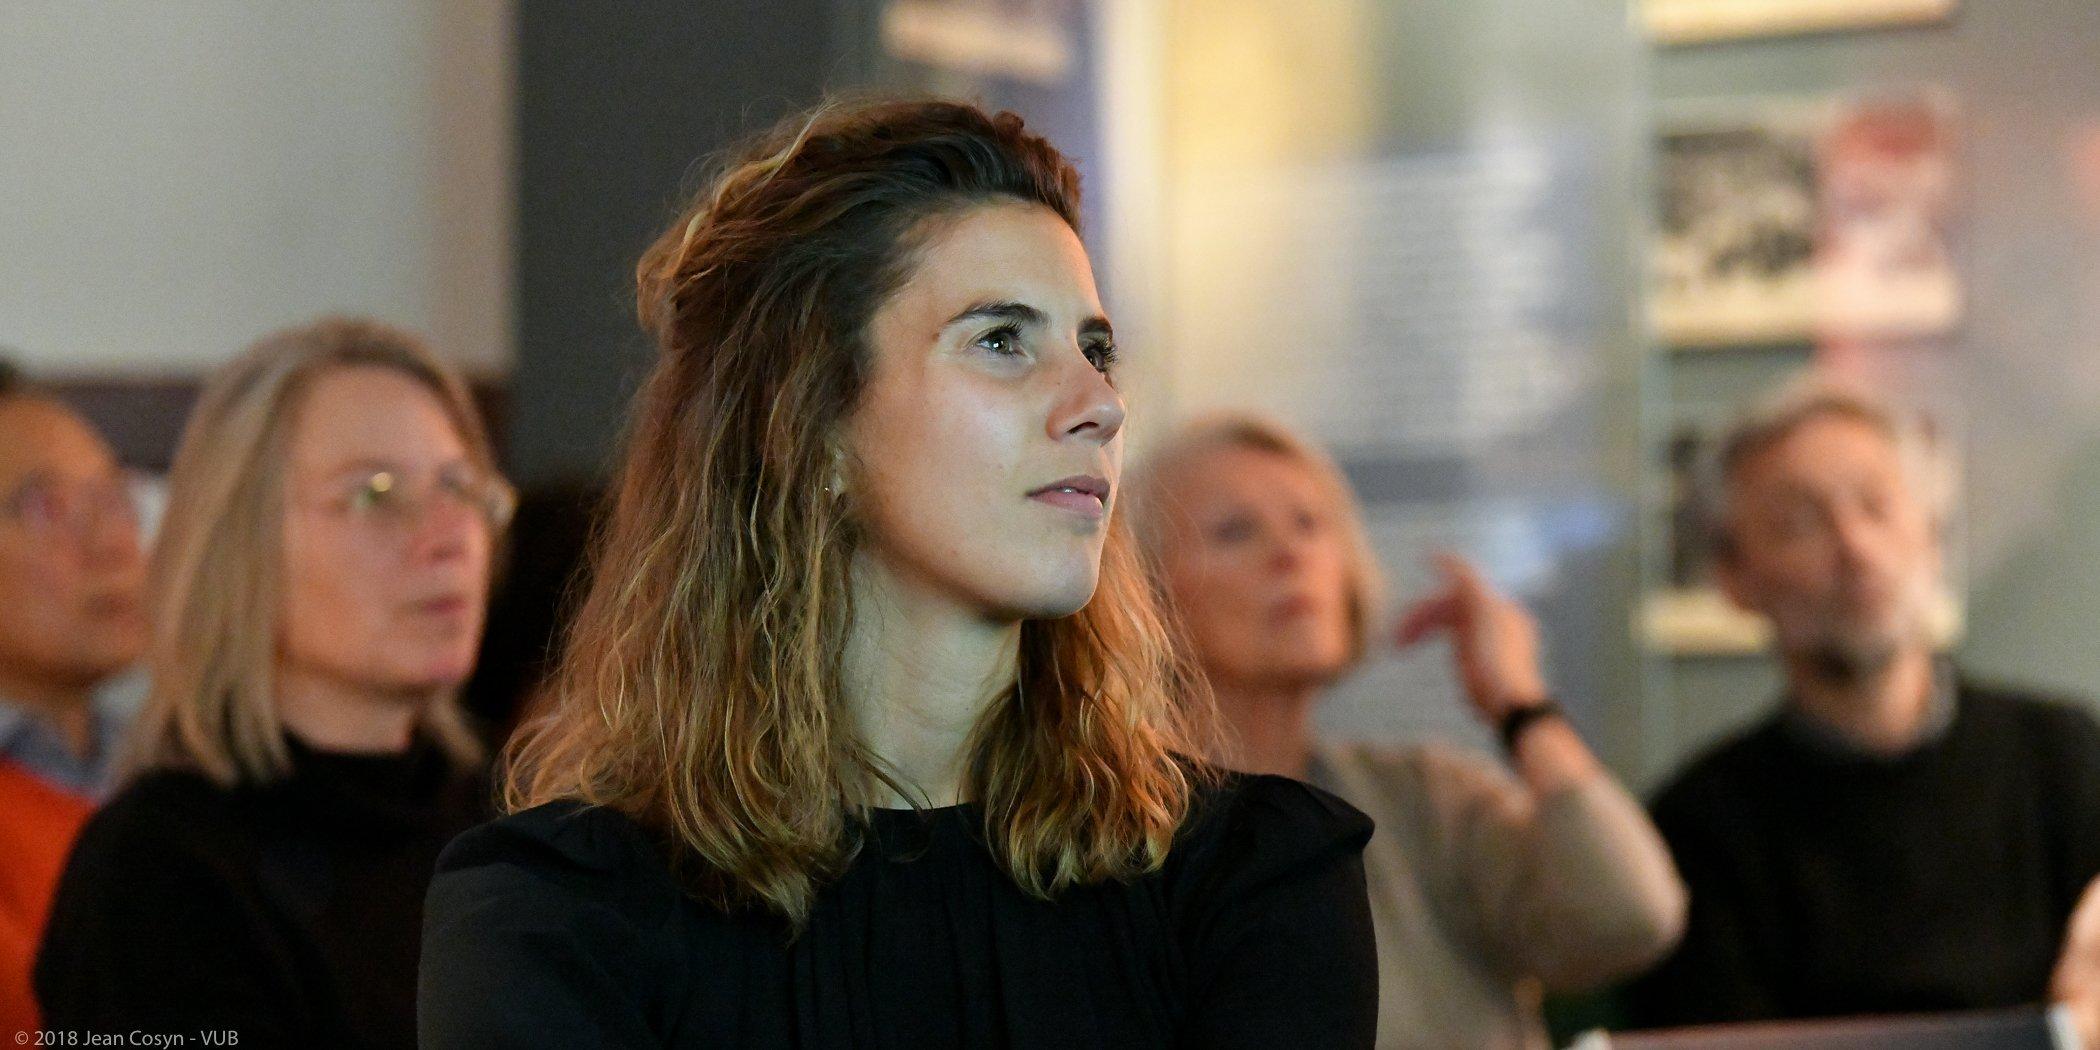 20181123-013 VUB MoMuse Sophie DS Boekvoorstelling